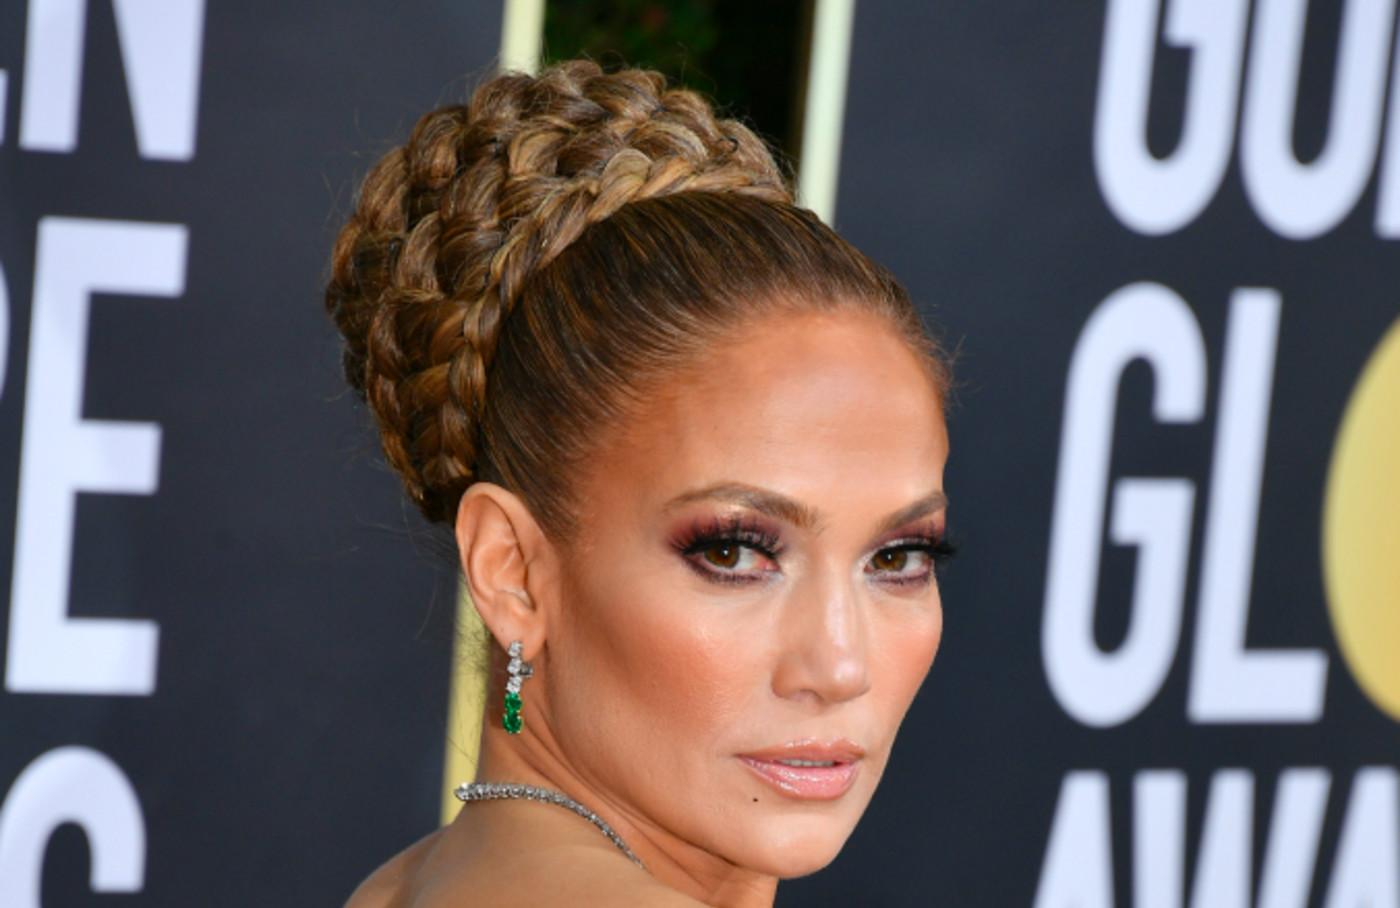 Jennifer Lopez attends the 77th Annual Golden Globe Awards